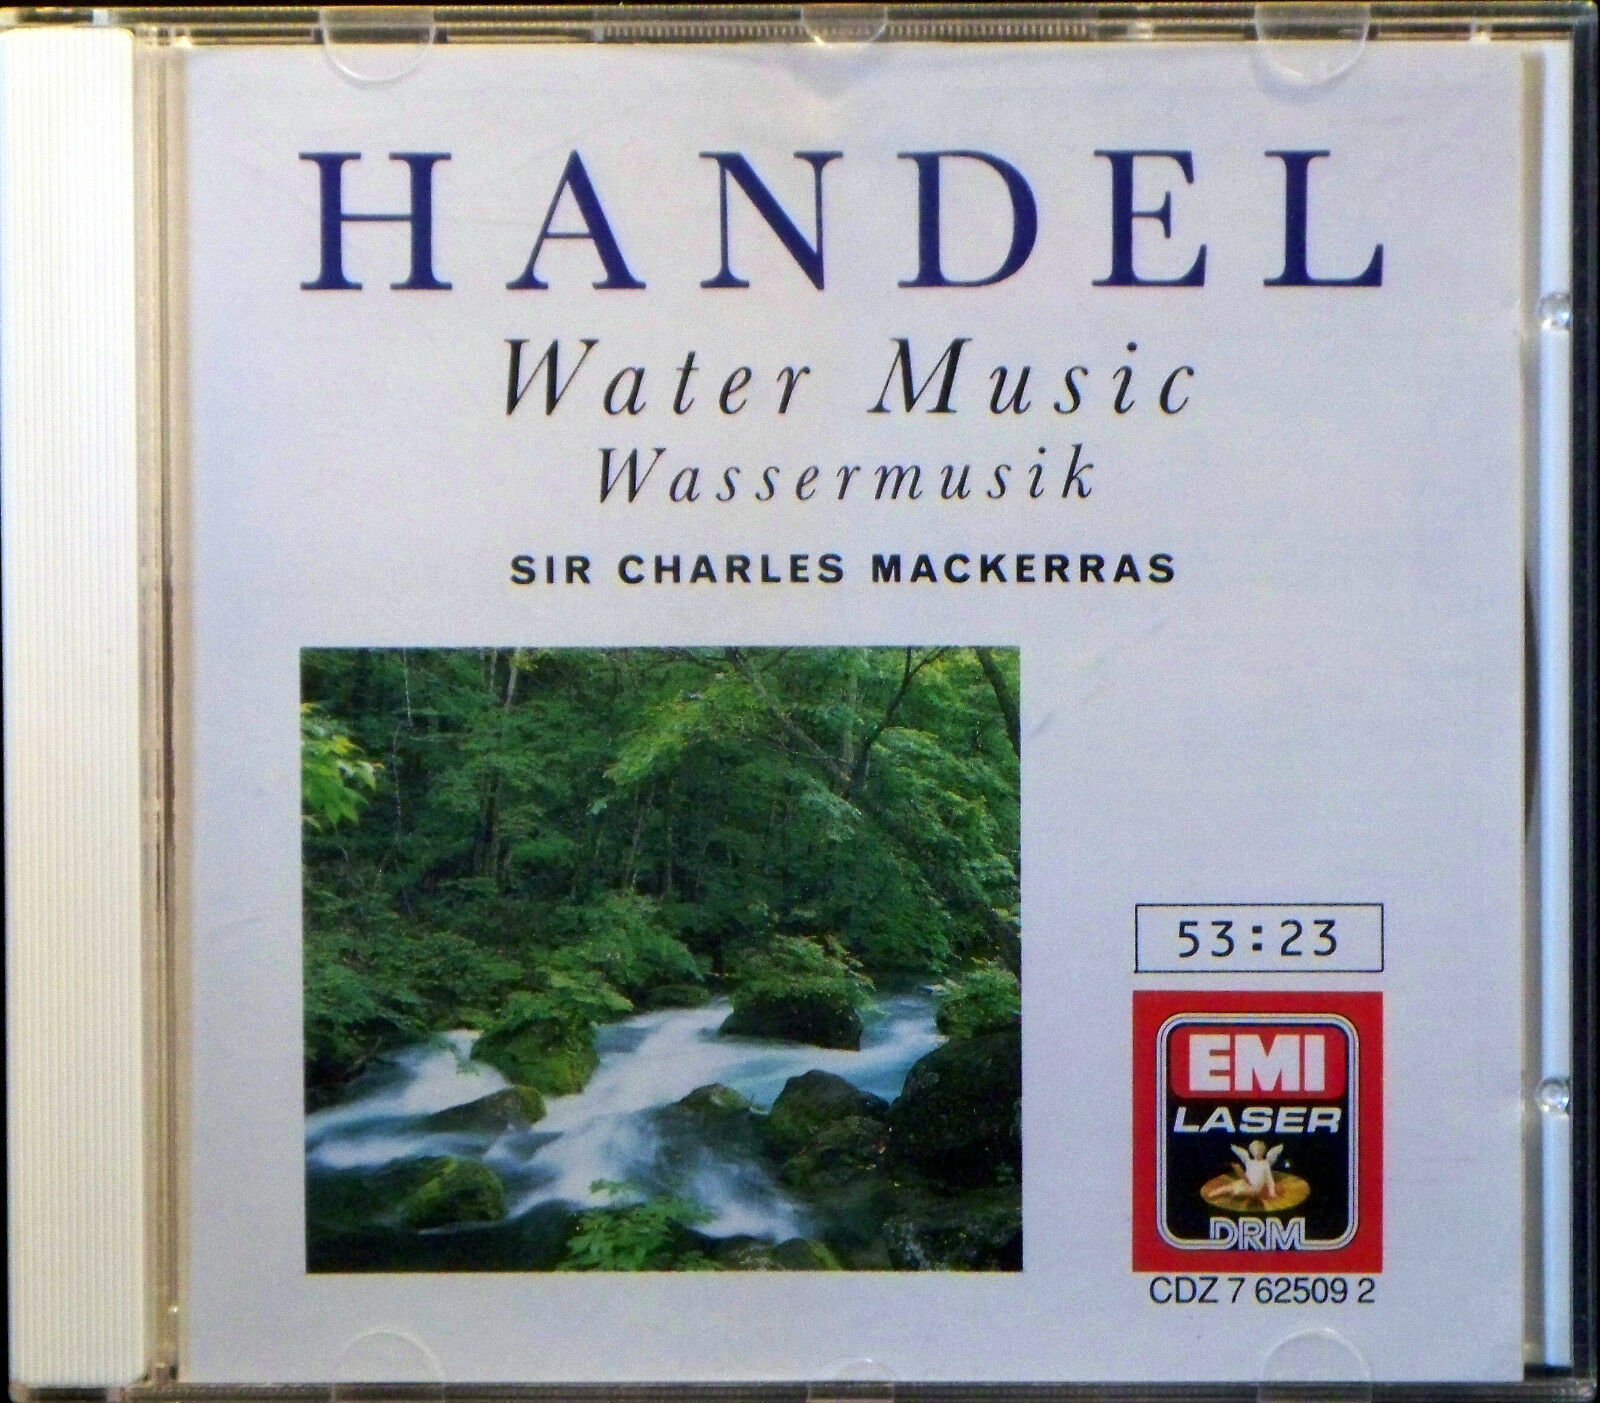 Handel: Water Music (CD, EMI Music Distribution) | eBay